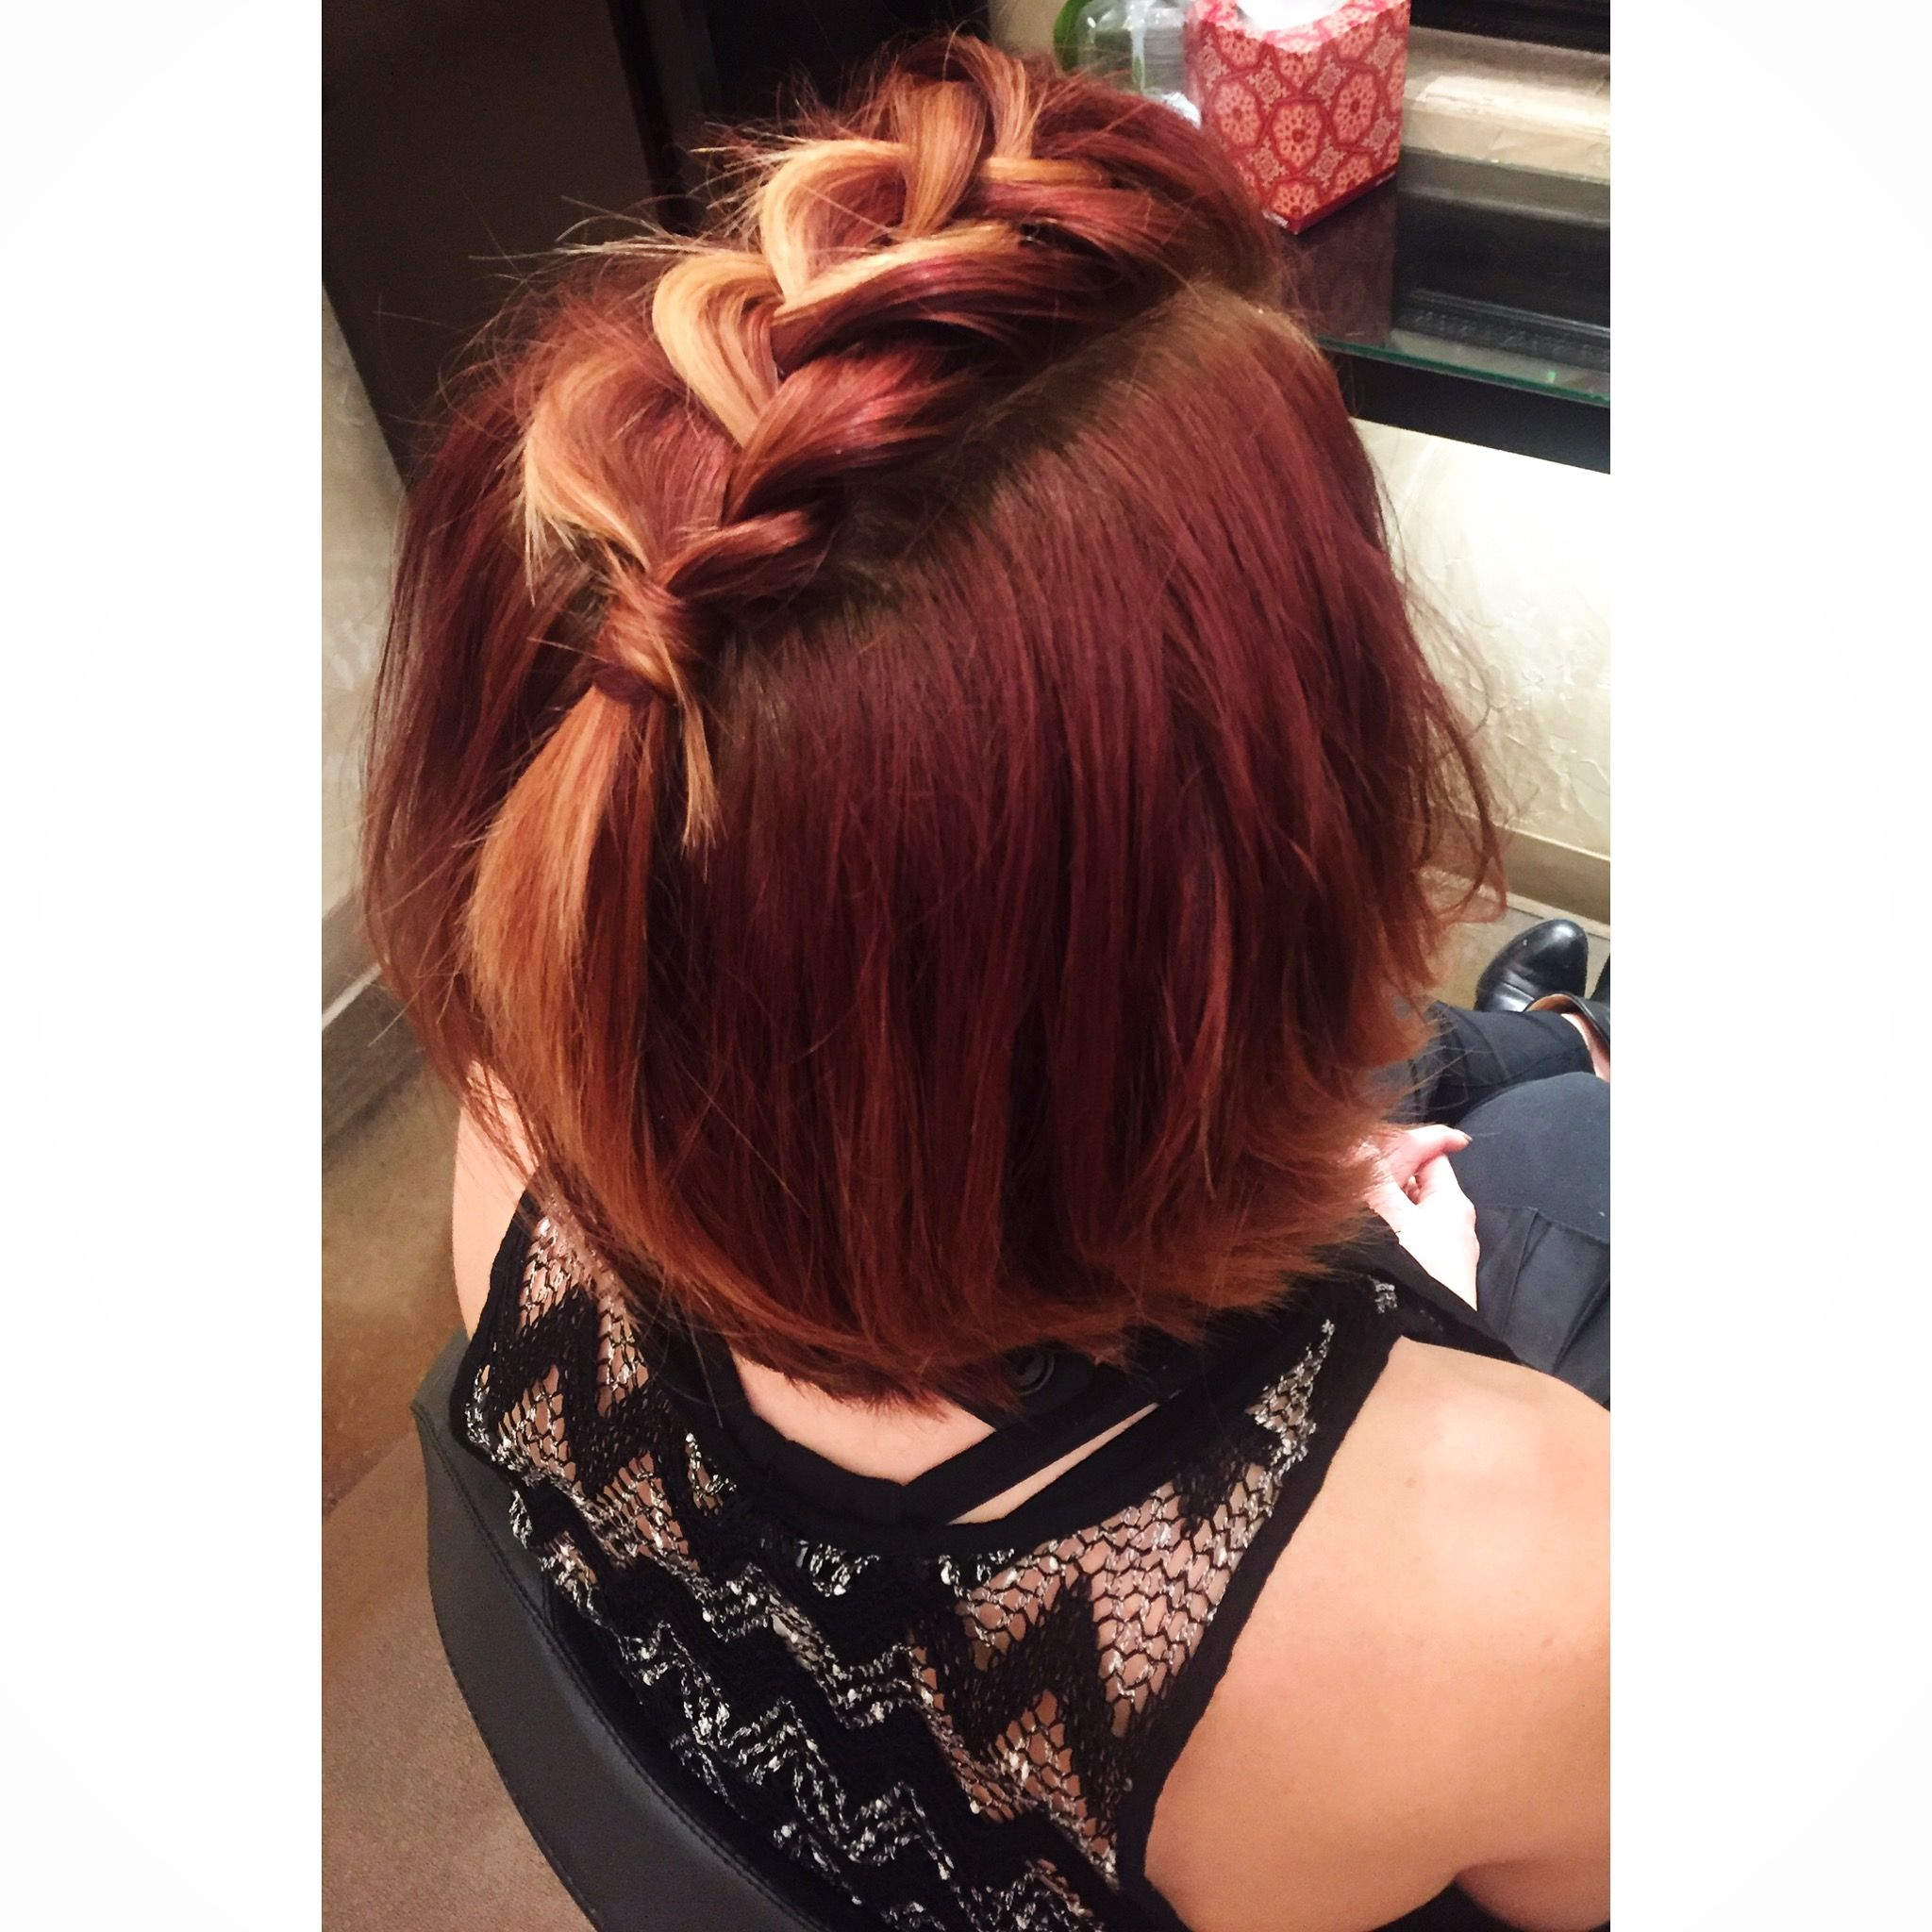 Mohawk braid instagram haileyhagler personal hairstyles